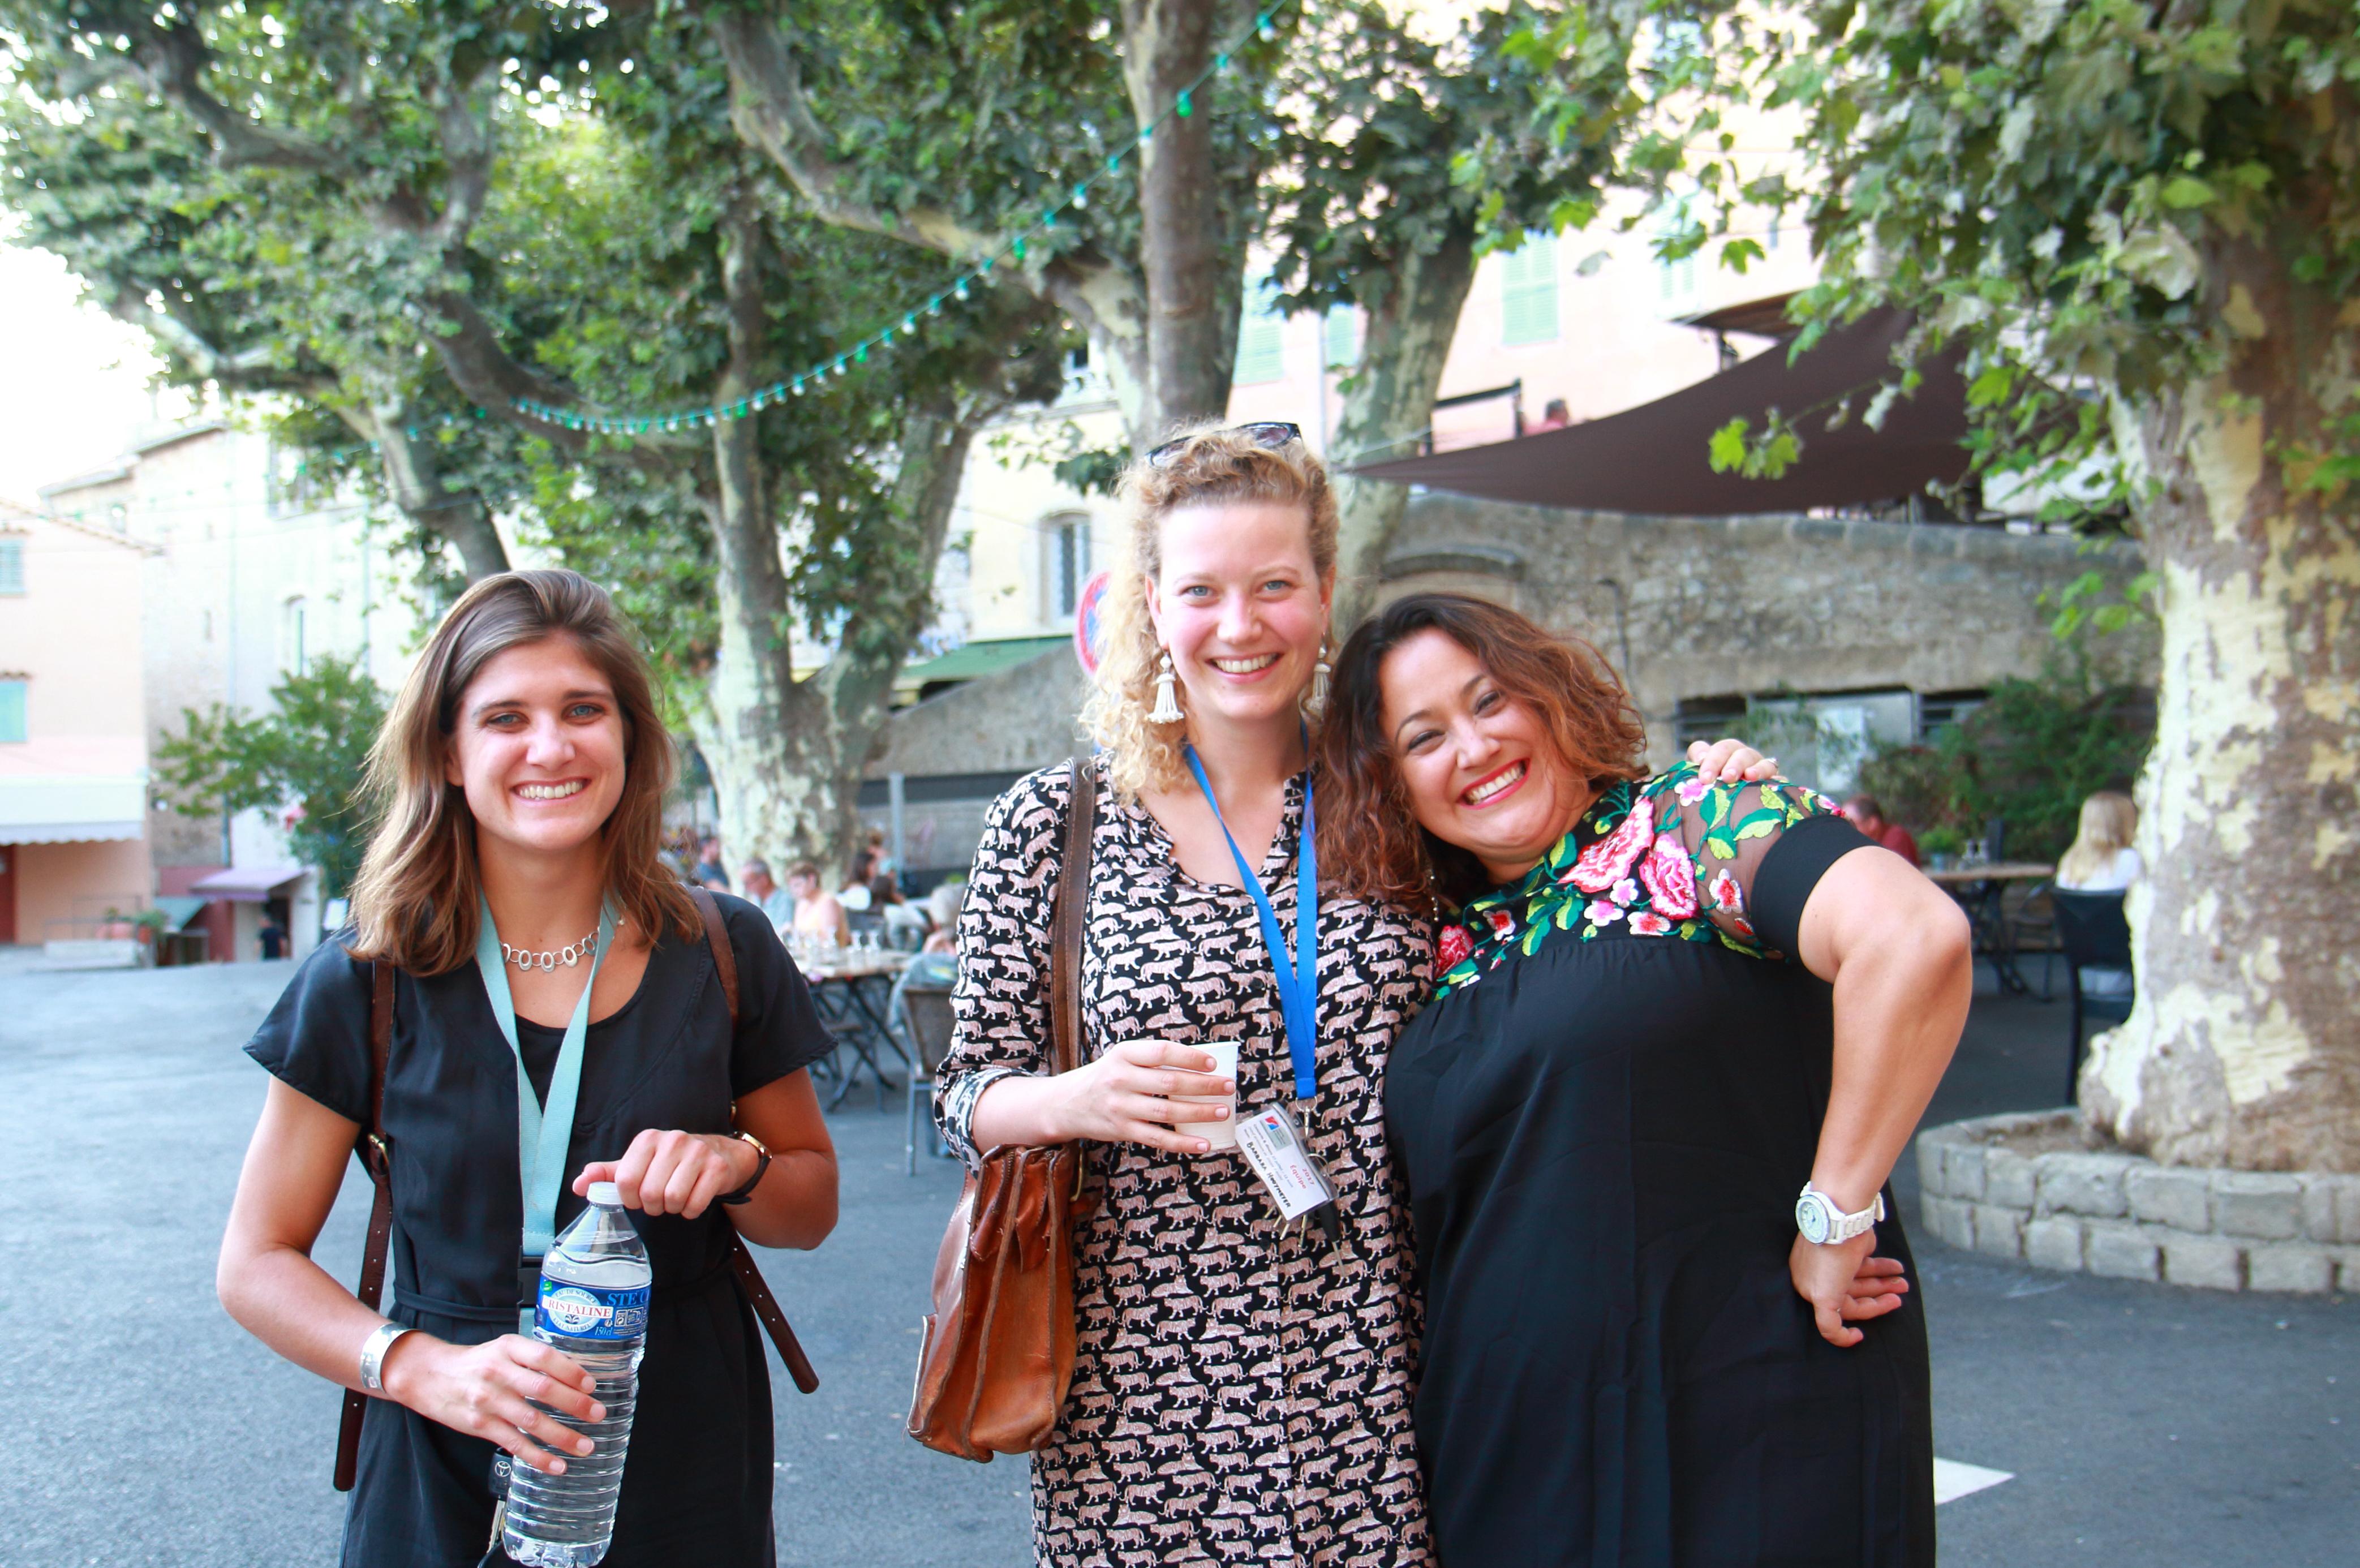 L'équipe administrative 2017-2018: Hannah Stodart, Barbara Hooijmeijer & Monica Herrera-Pavia